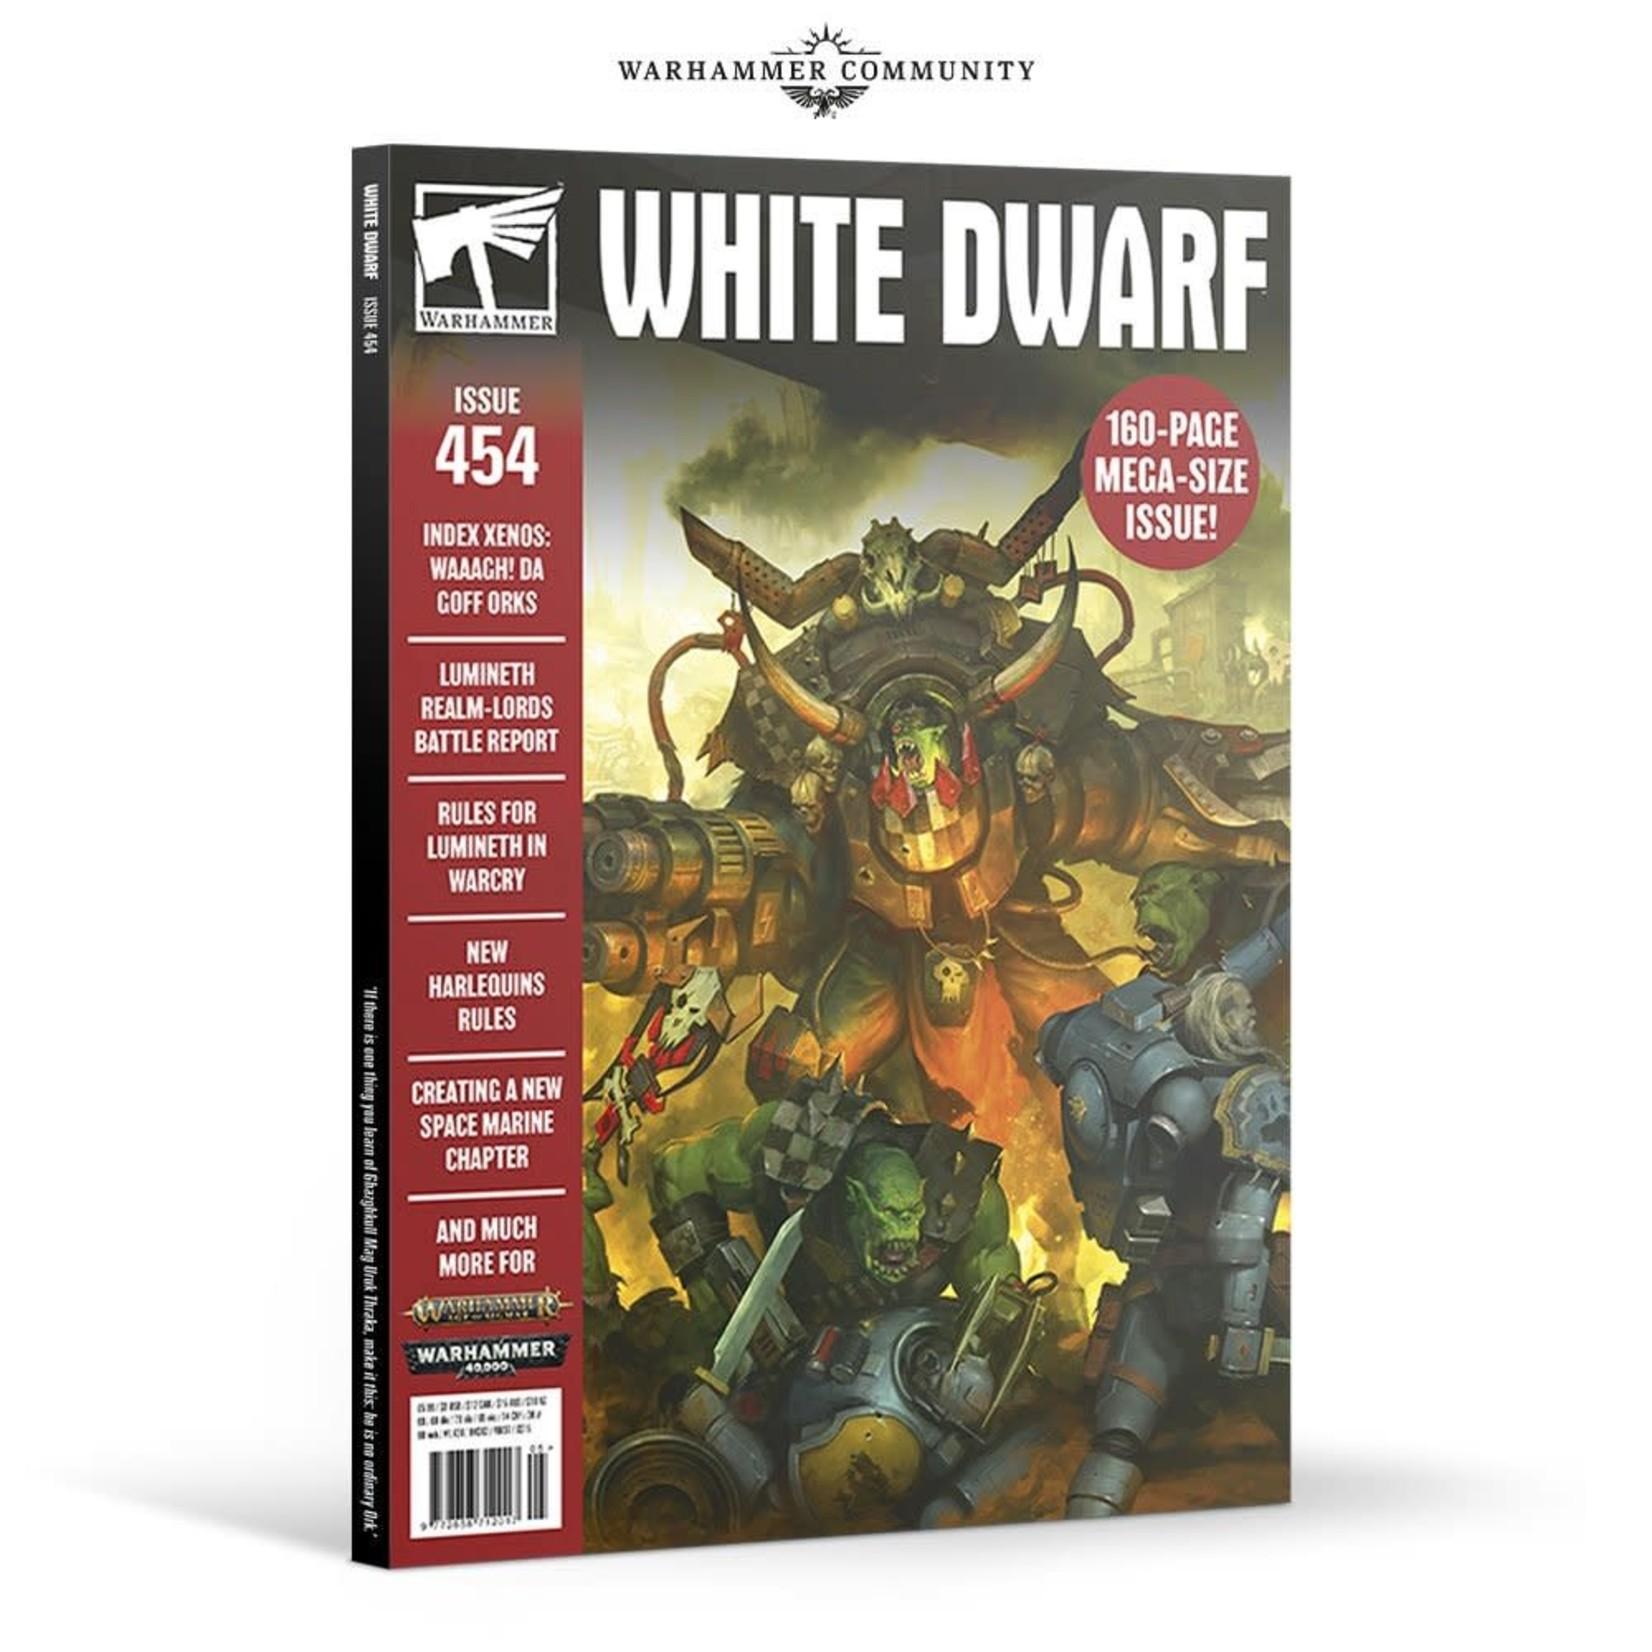 Games Workshop White Dwarf 2020 - July (454)